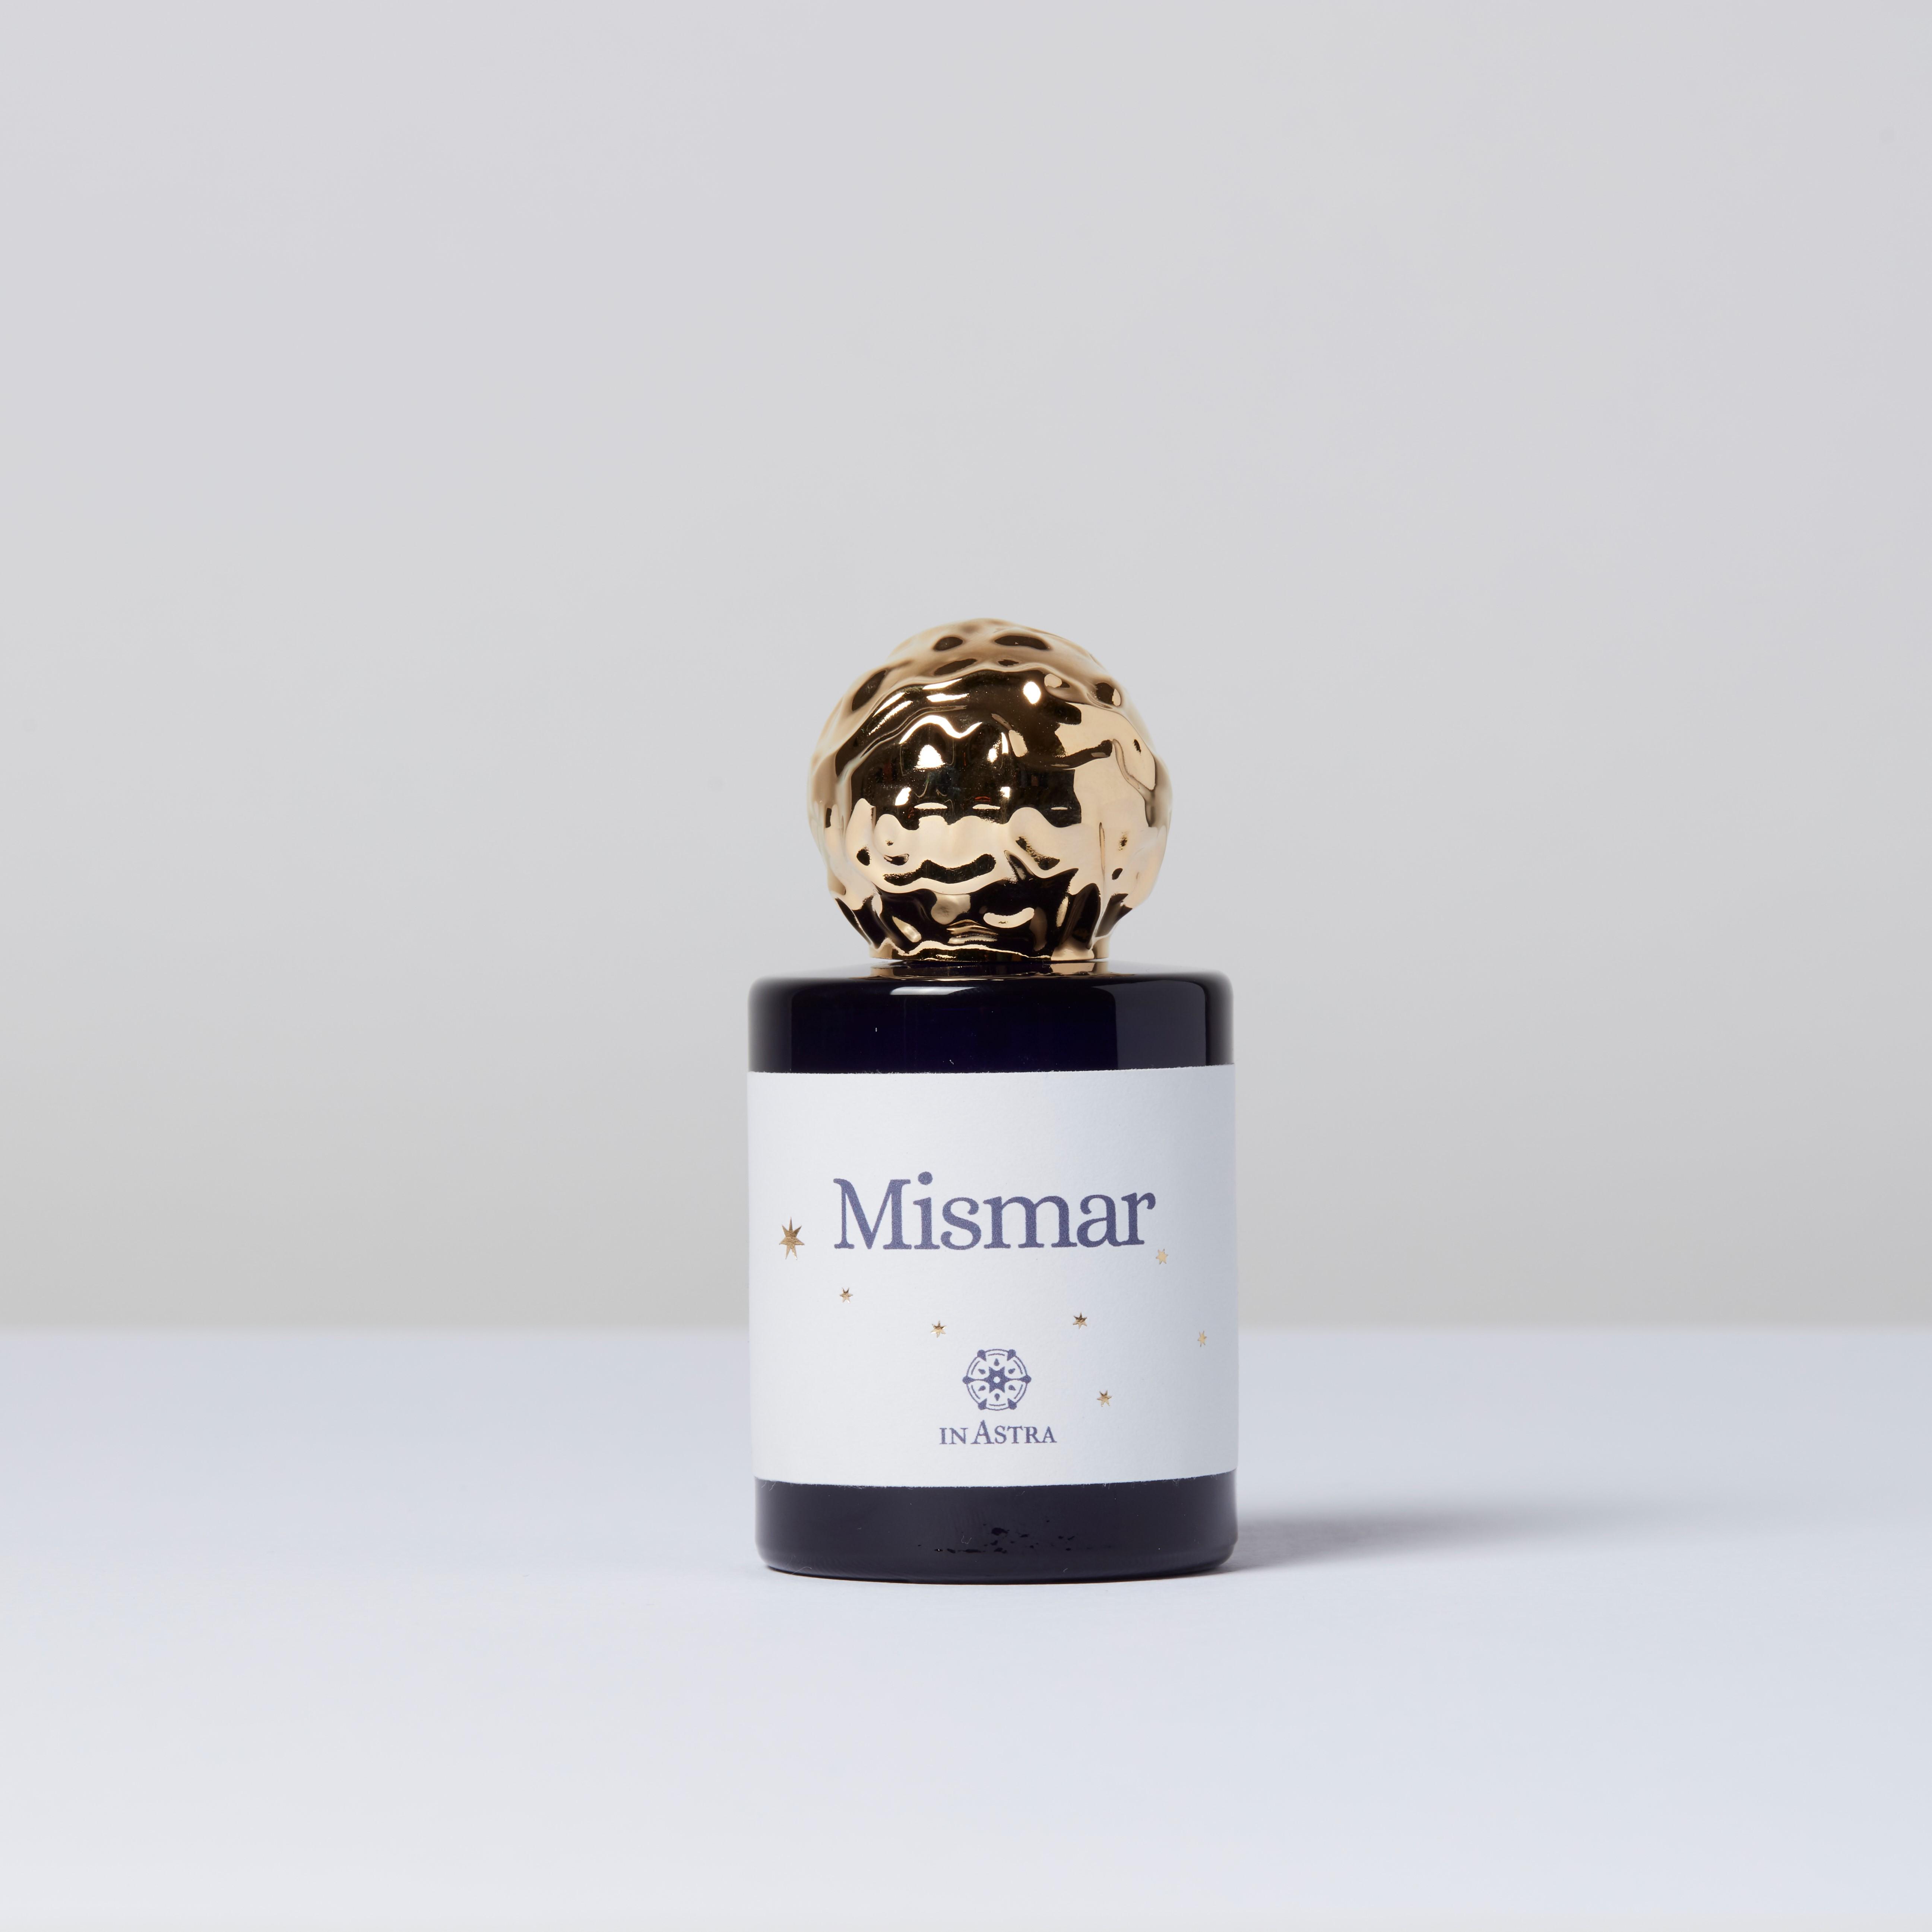 In Astra Mismar bottle